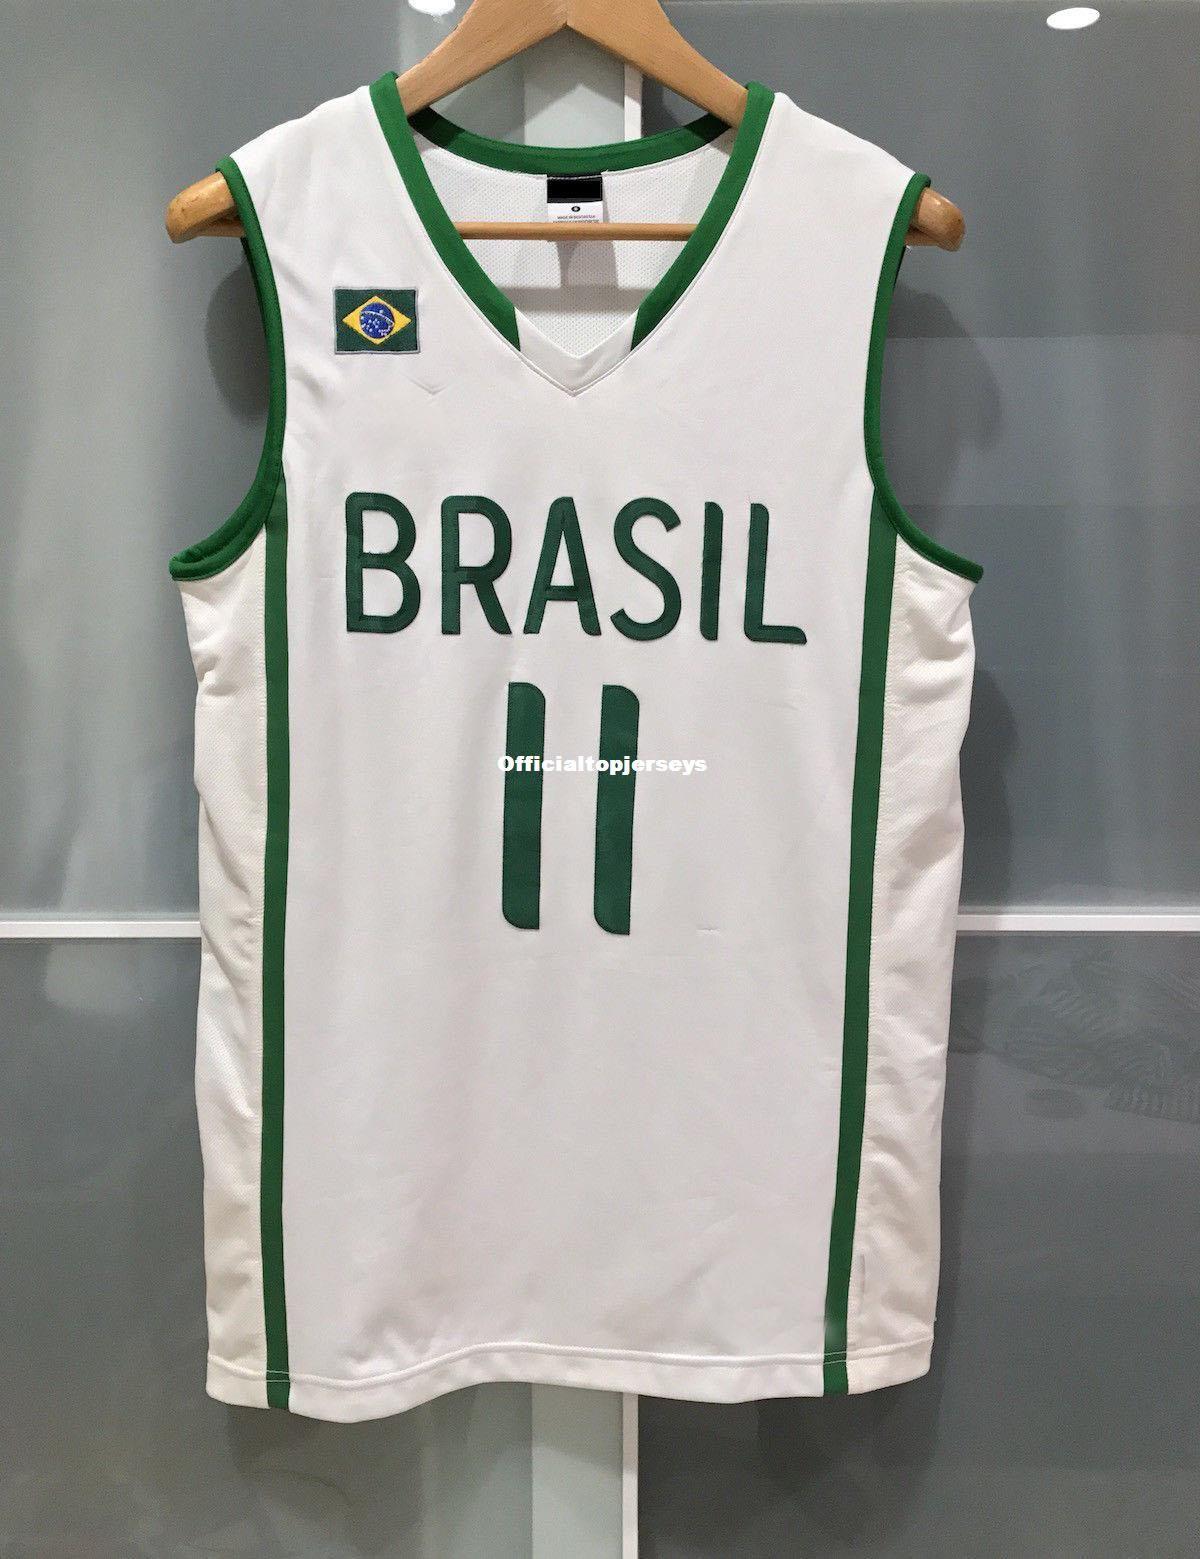 e92be9e07bdd 2019 Cheap Wholesale RARE Nk BRAZIL VAREJAO BASKETBALL JERSEY FIBA WBC  White T Shirt Vest Stitched Basketball Jerseys Ncaa From  Officialtopjerseys